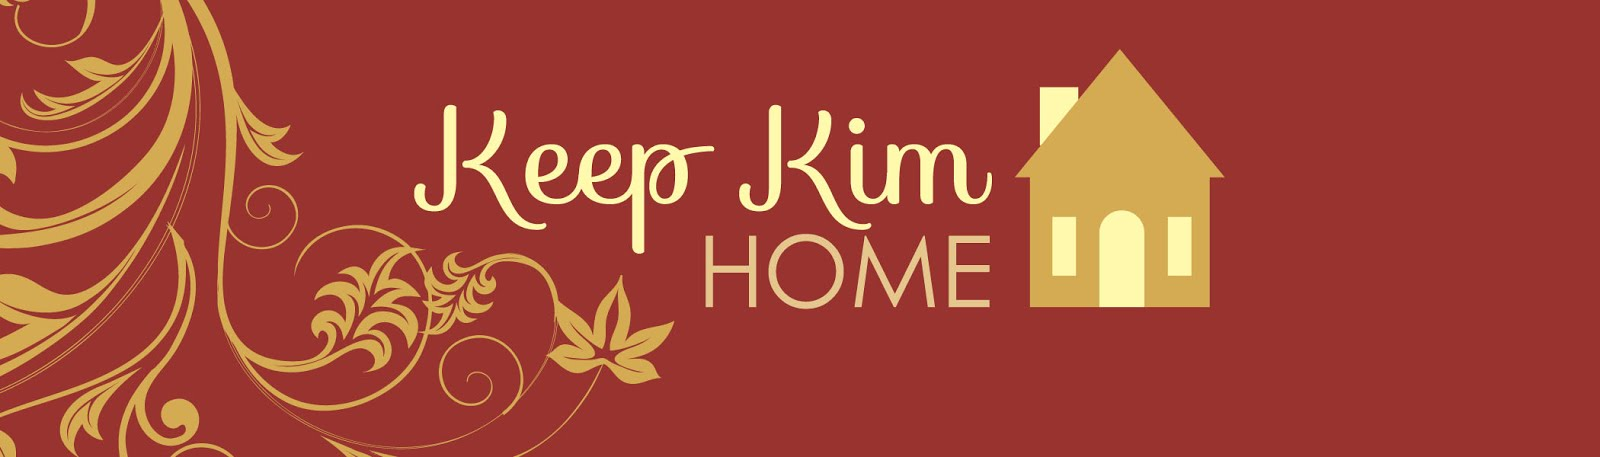 KEEP KIM HOME